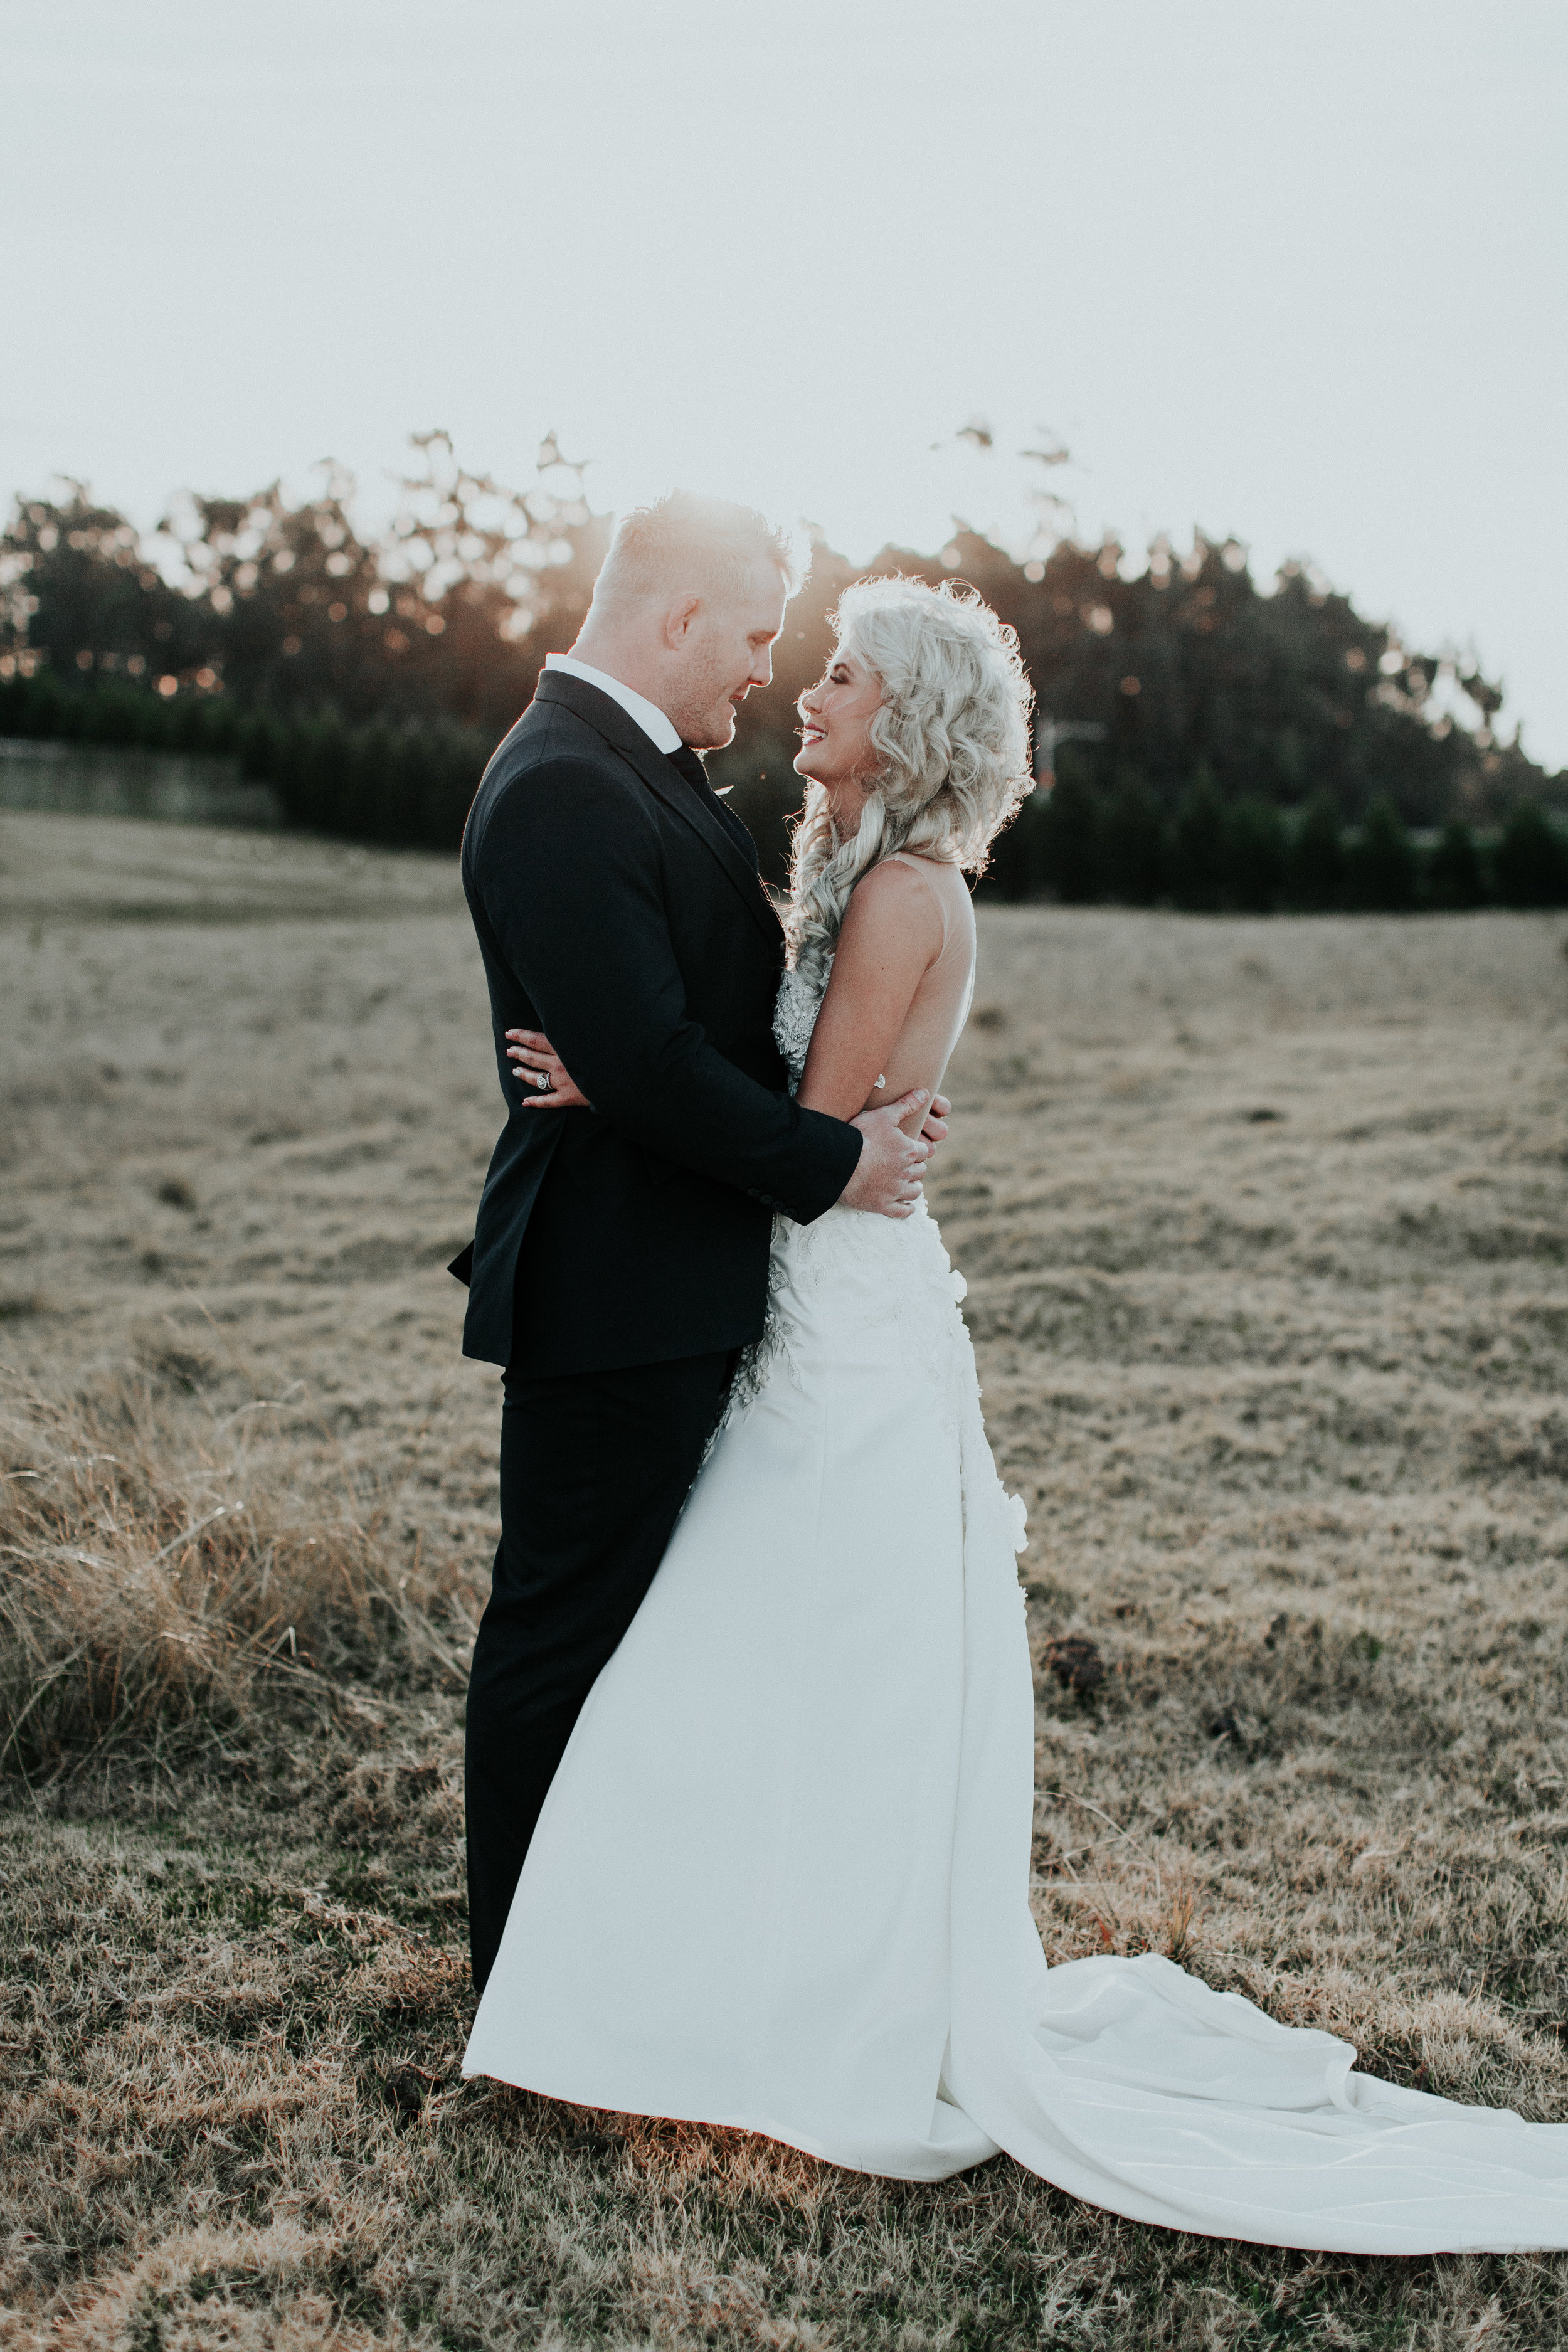 Kristi Smith Photography_Vincent&Jandre_ Wedding Photographer 16.jpg